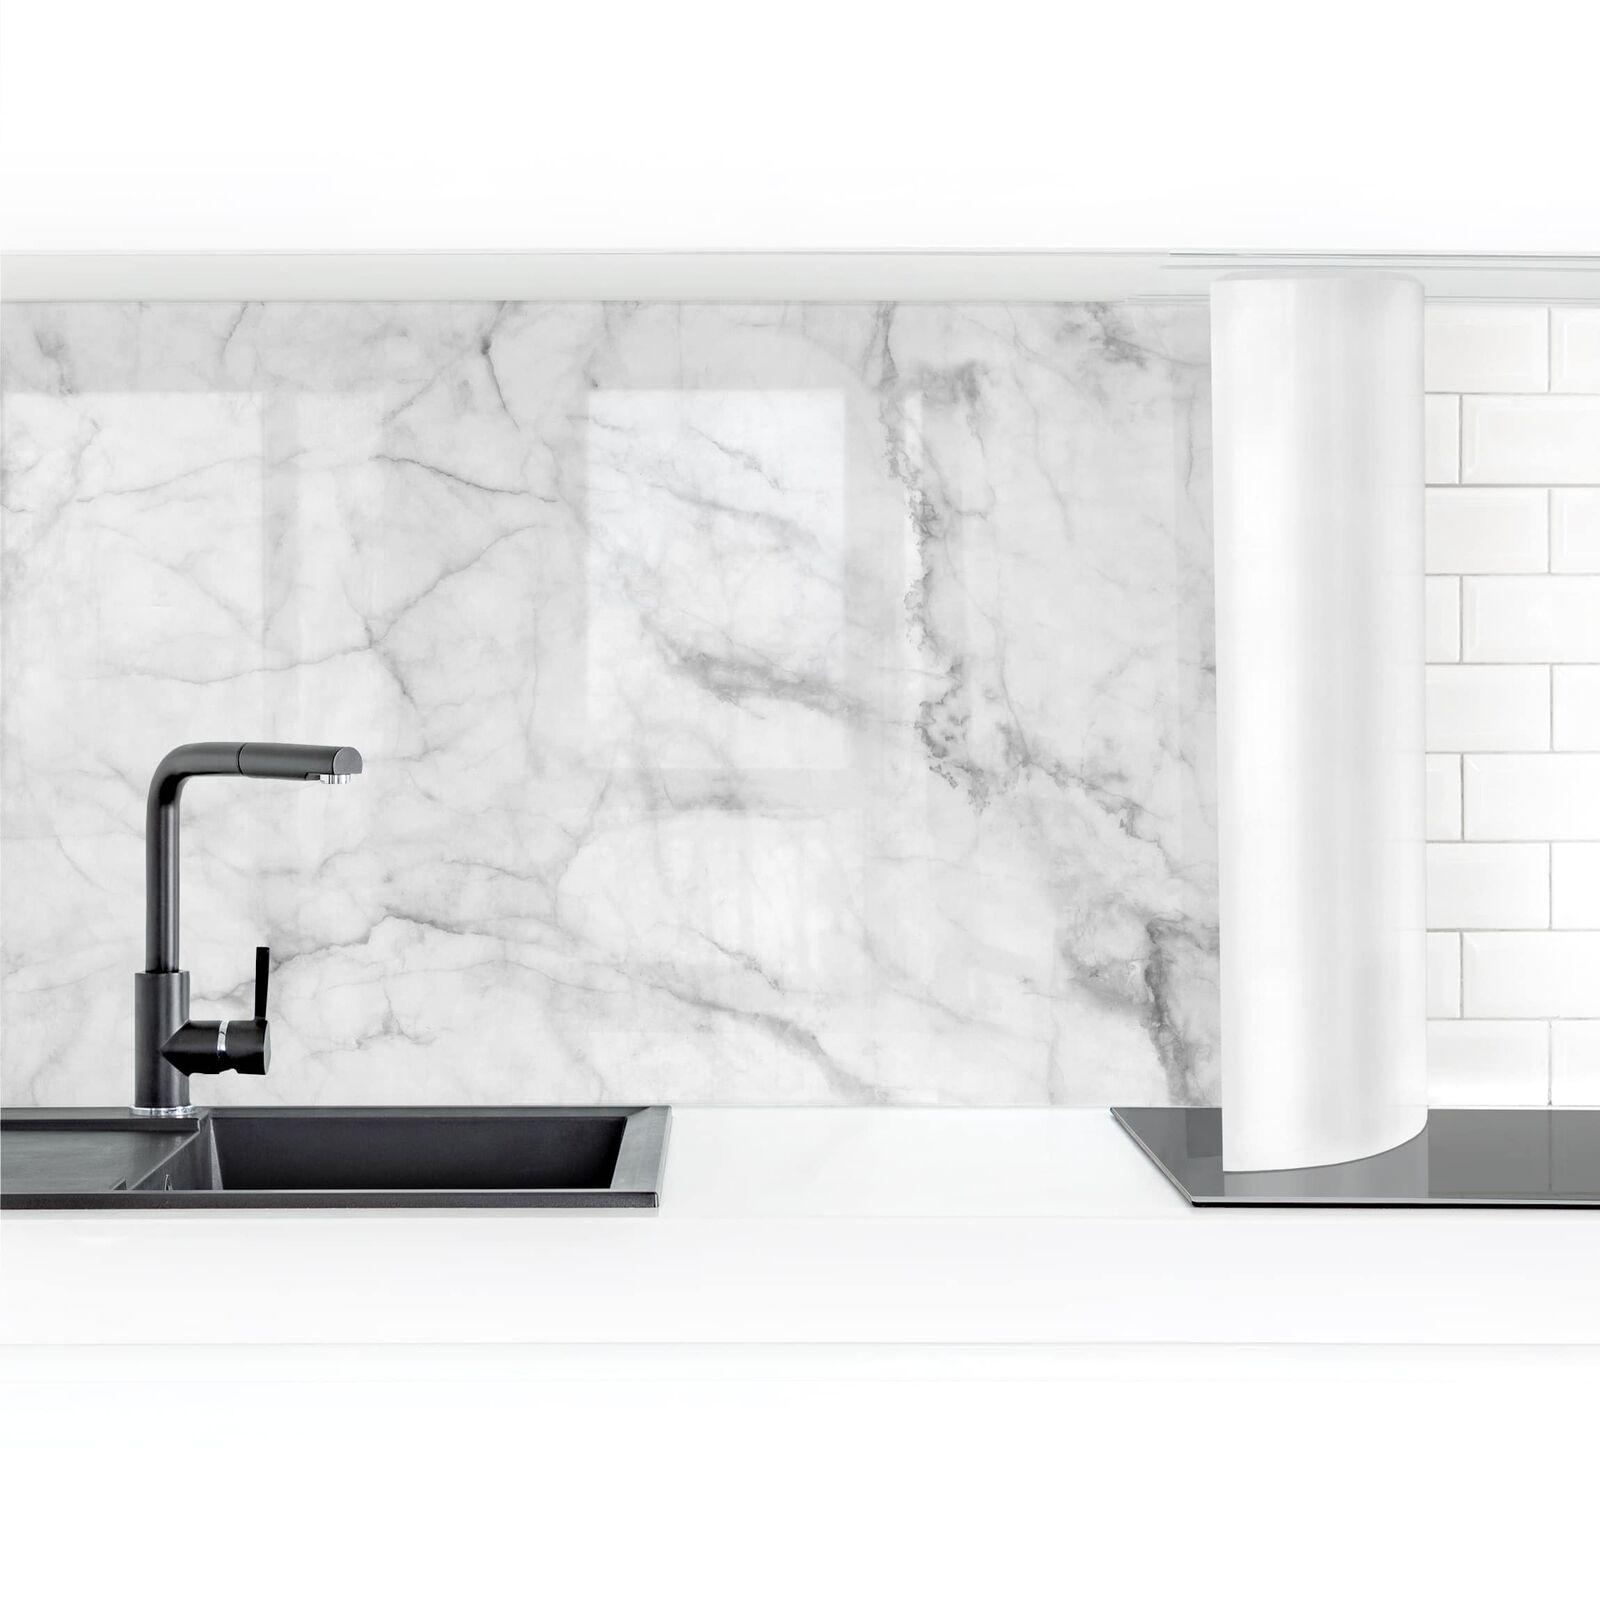 Küchenrückwand Bianco Carrara Folie selbstklebend Länge wählbar Spritzschutz